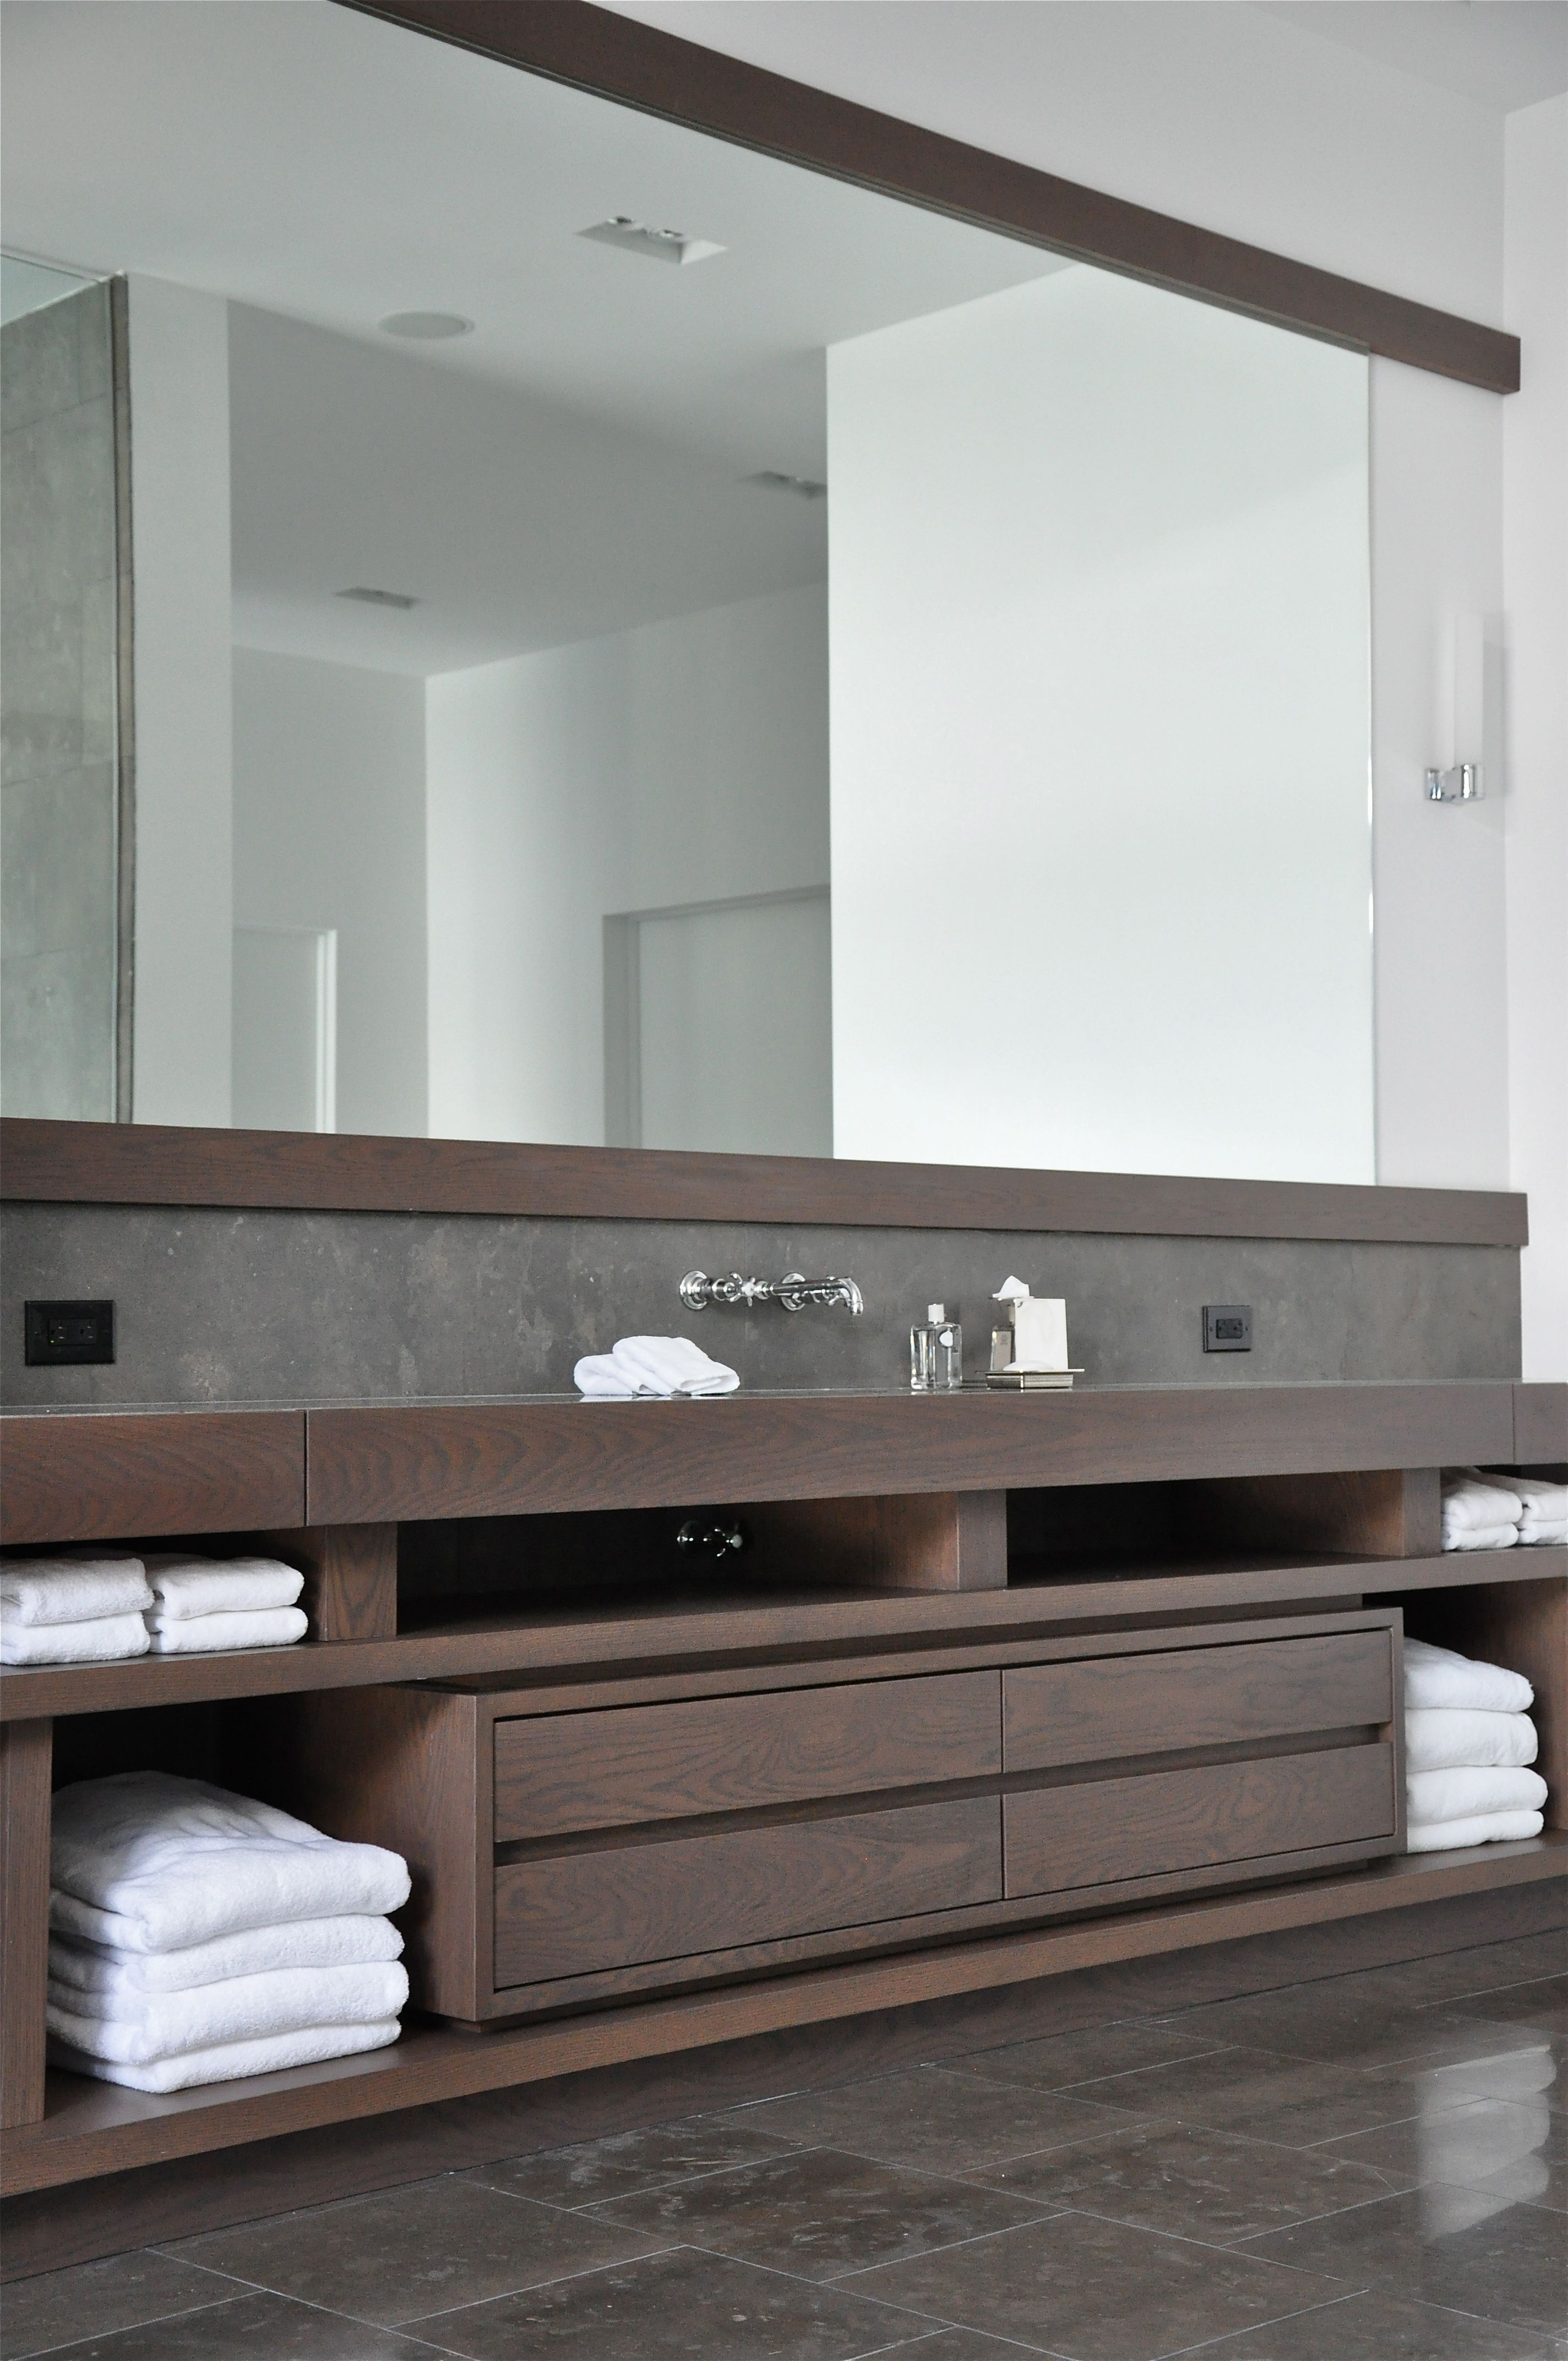 Contemporary Bathroom Wall Cabinets 2021 in 2020 ...